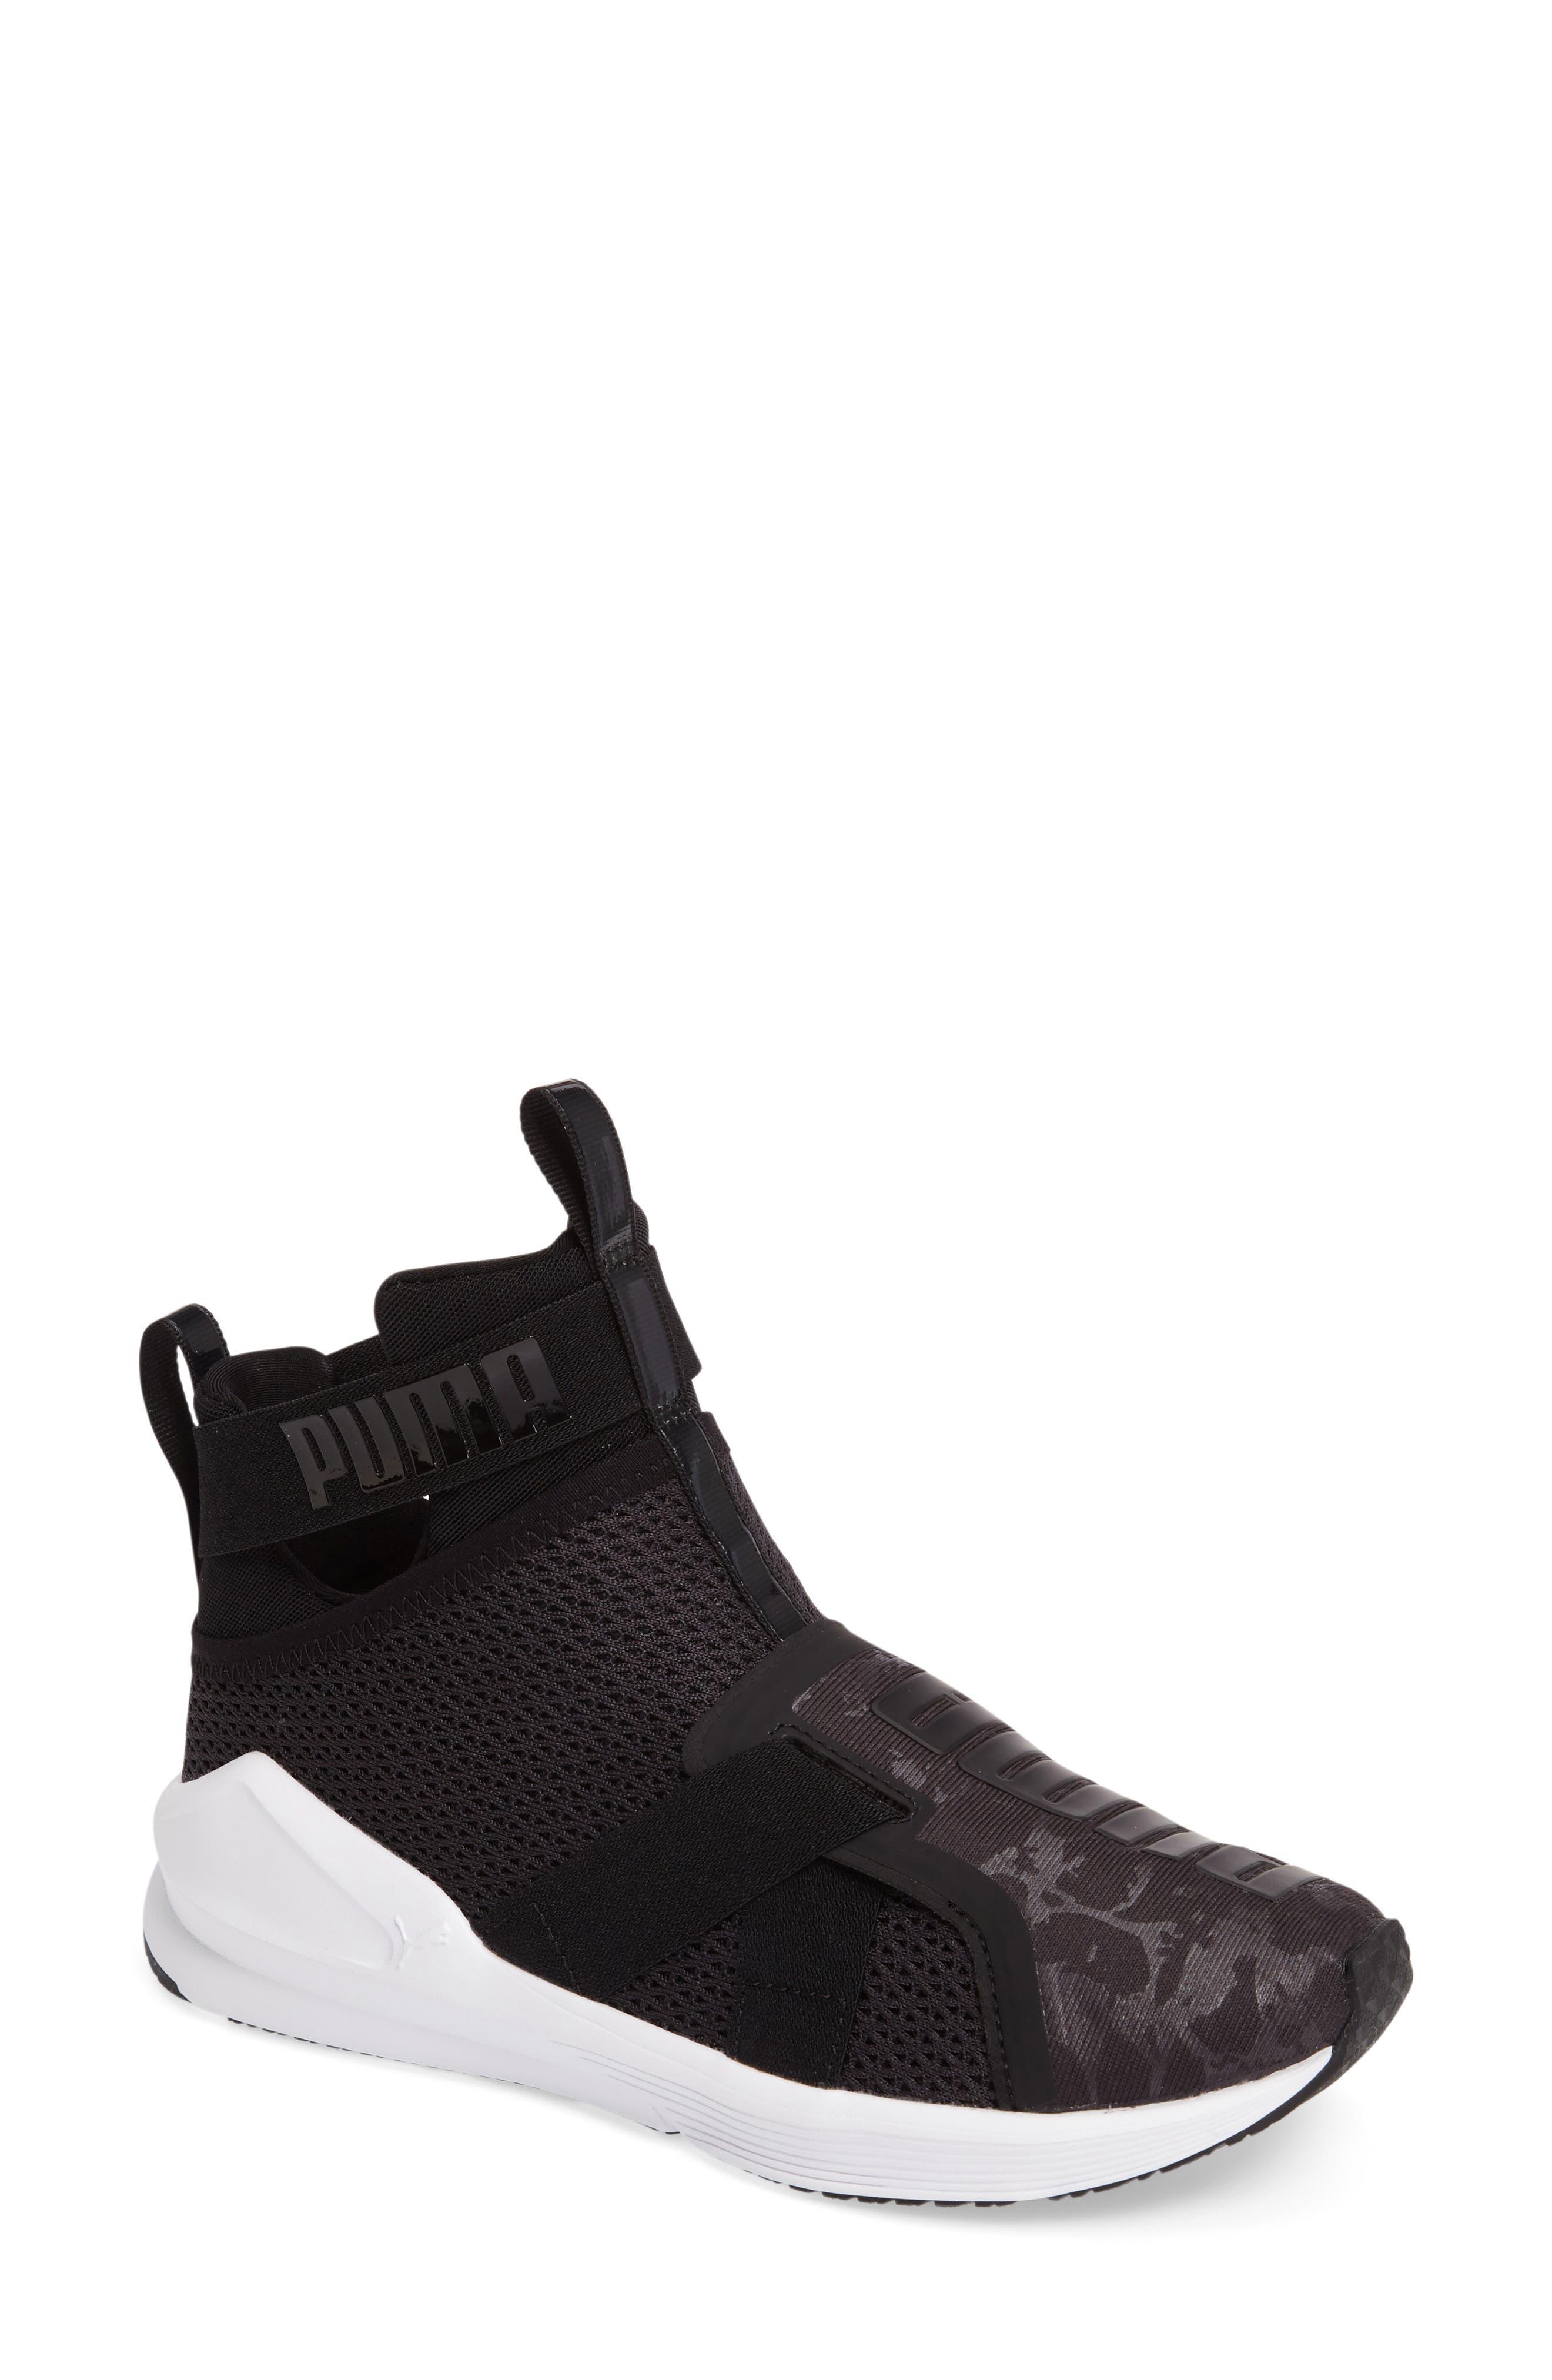 Fierce Strap Training Sneaker,                             Main thumbnail 1, color,                             Black/ White